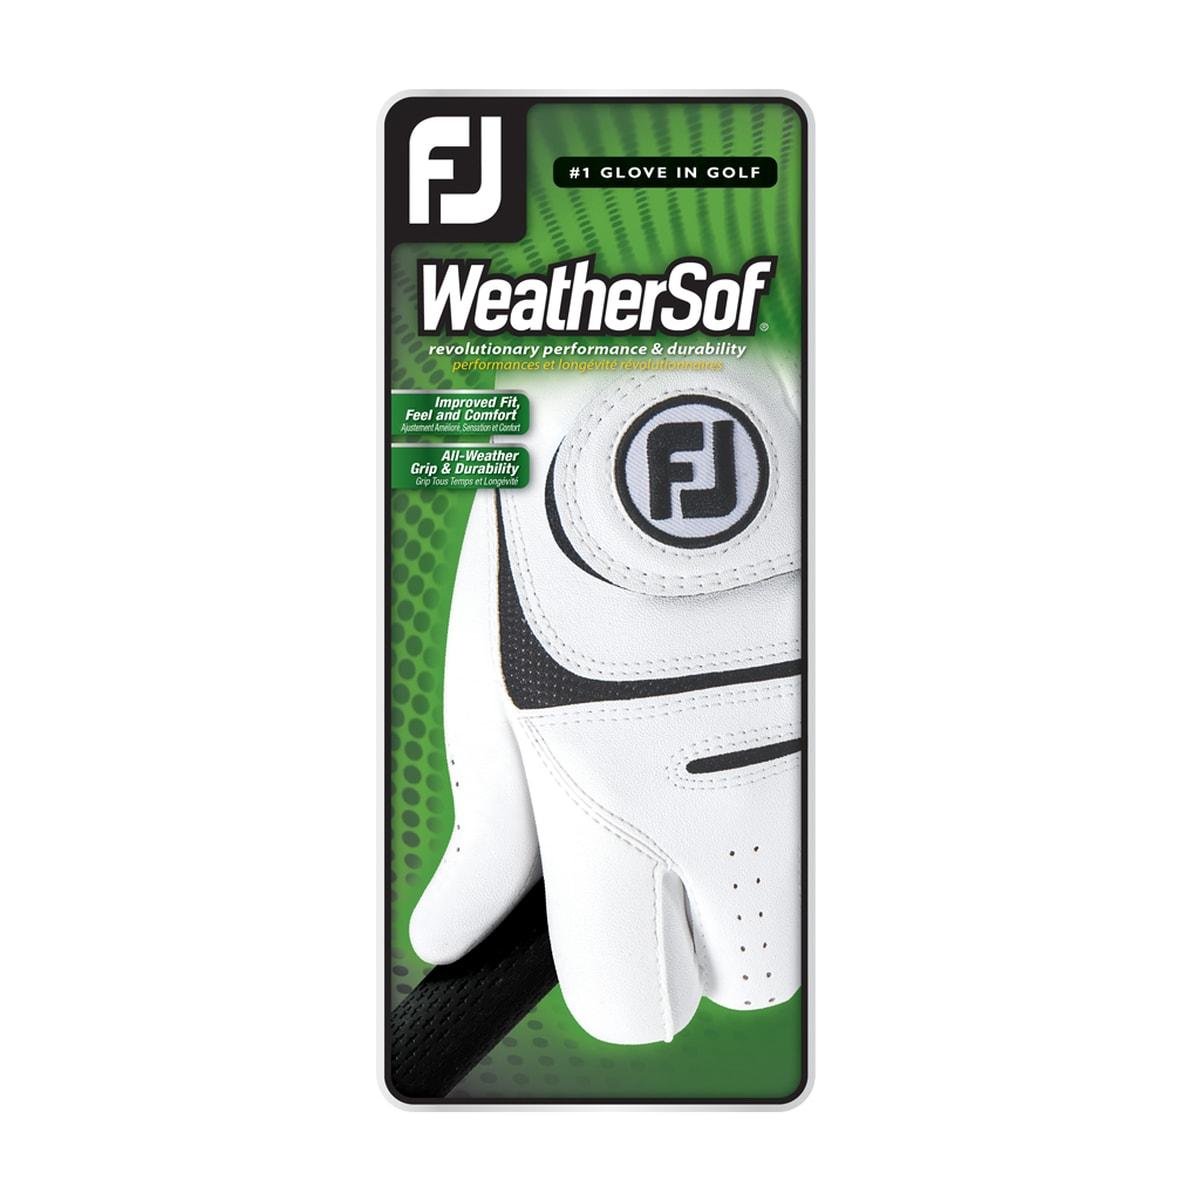 WeatherSof